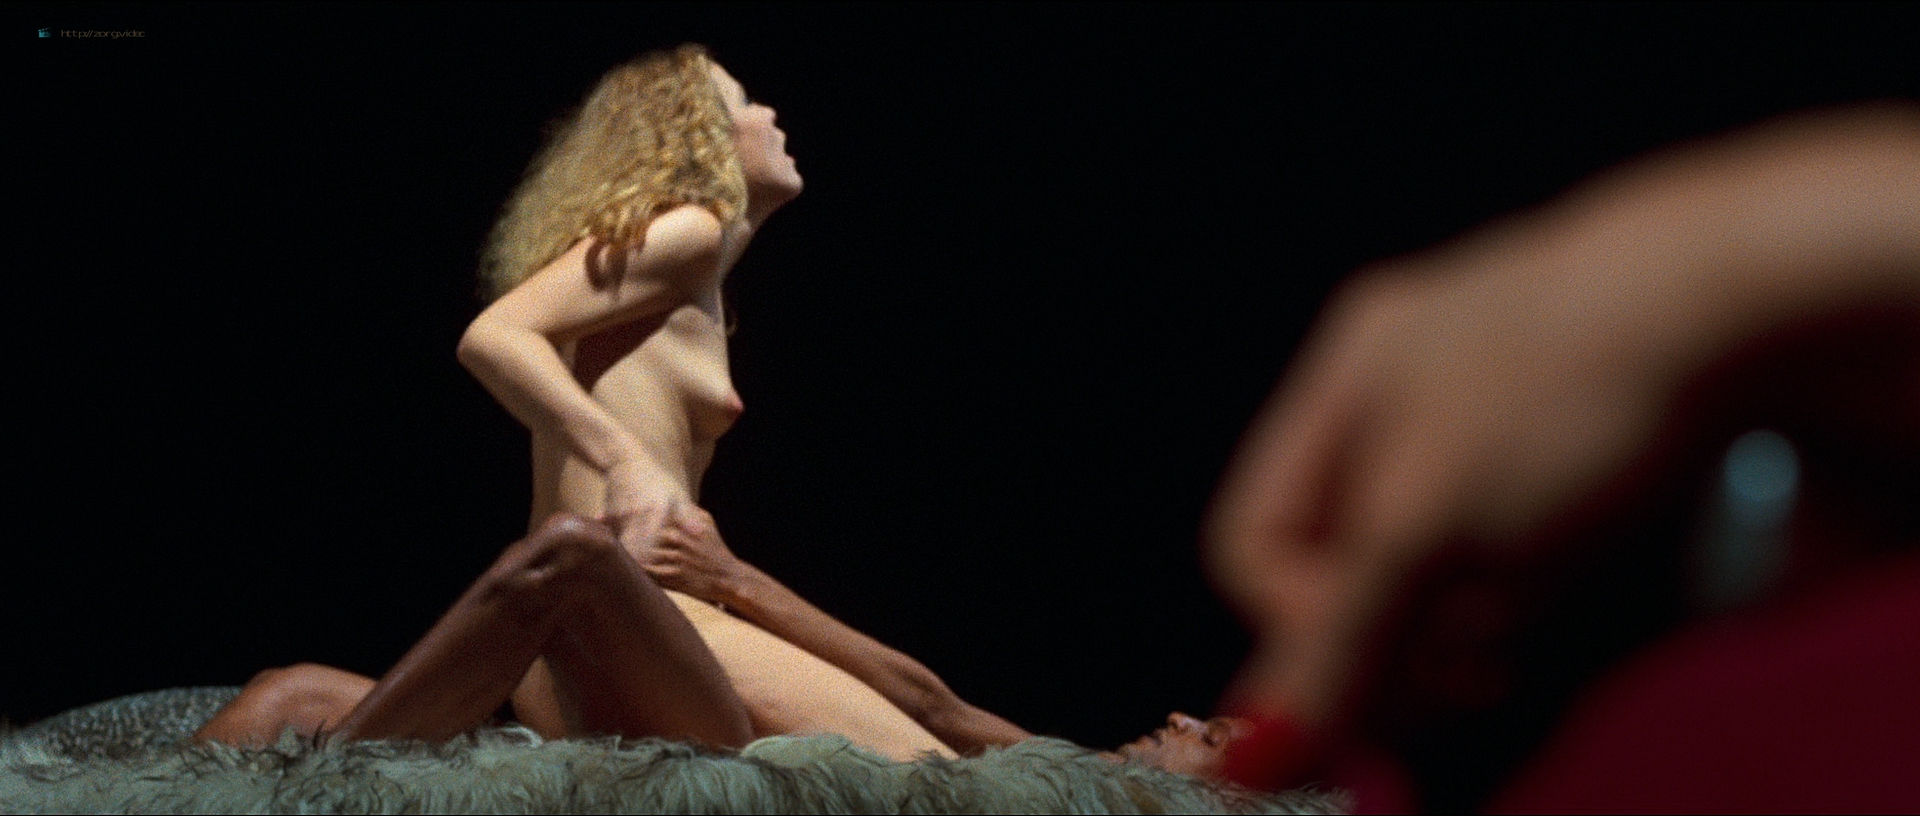 Daniela Doria nude full frontal Zora Kerova and other nude - The New York Ripper (IT-1982) HD 1080p BluRay(r) (13)